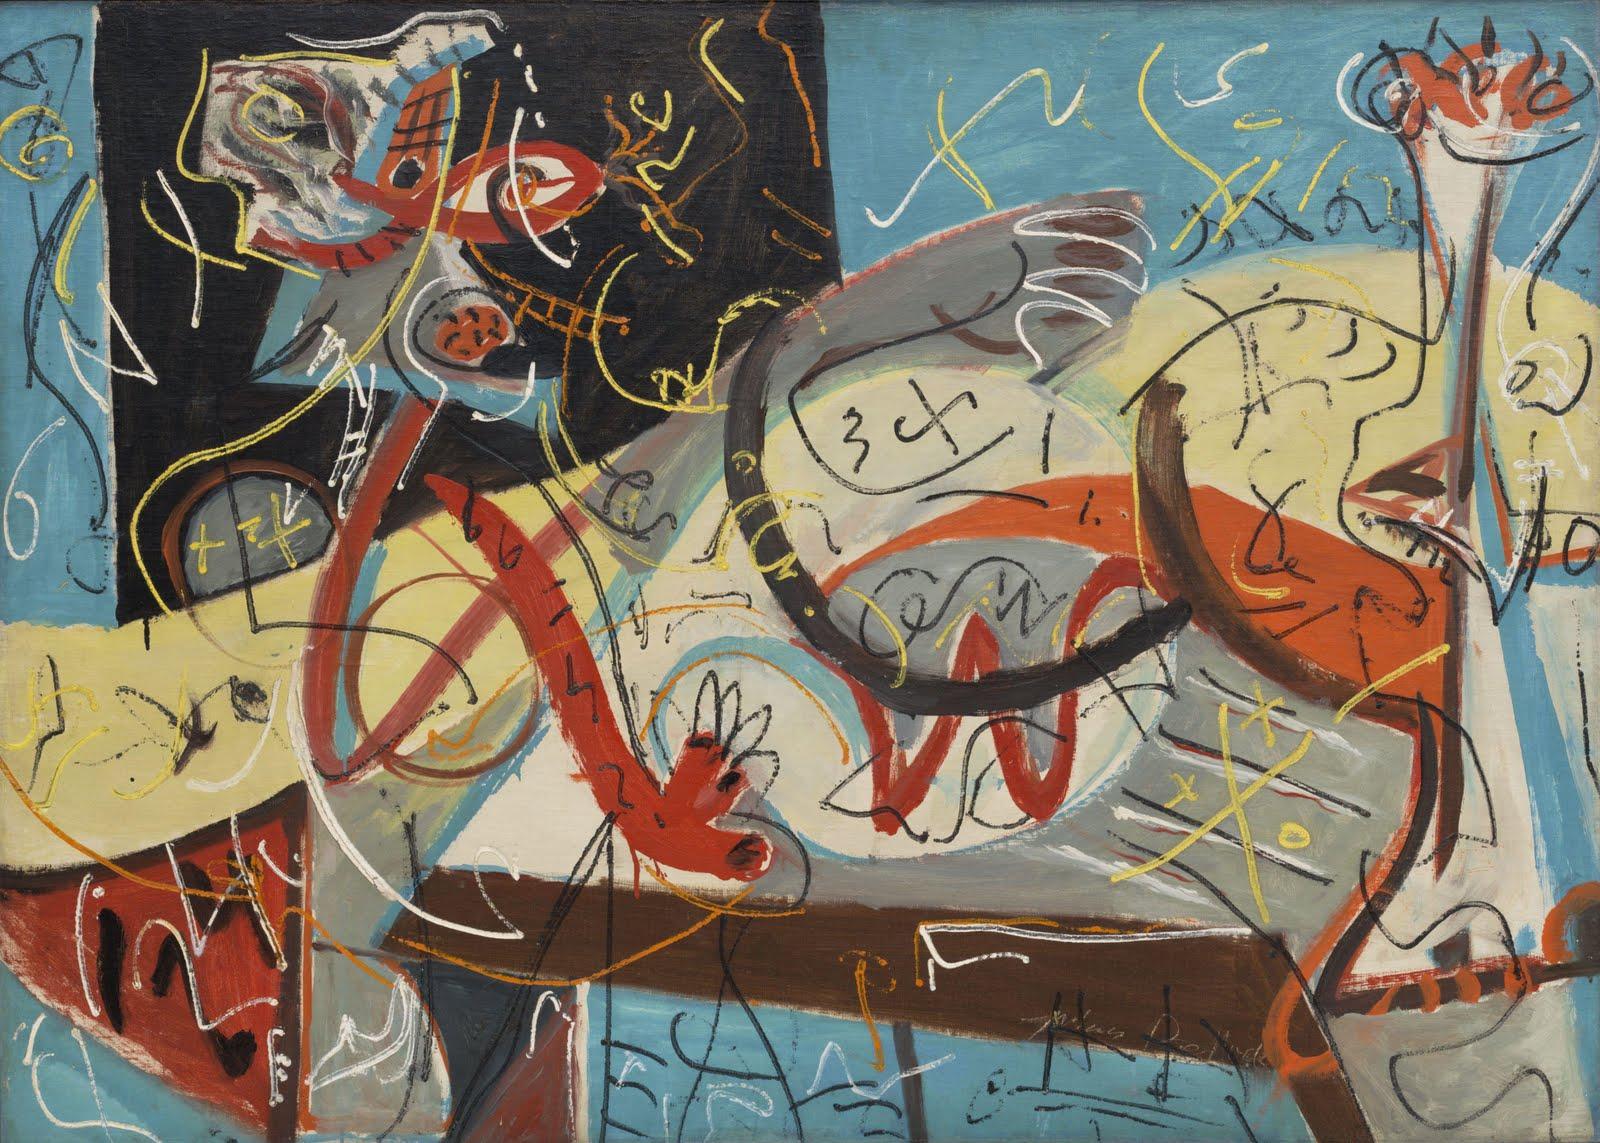 HISTORIA DEL AR... Jackson Pollock Number 10 1949